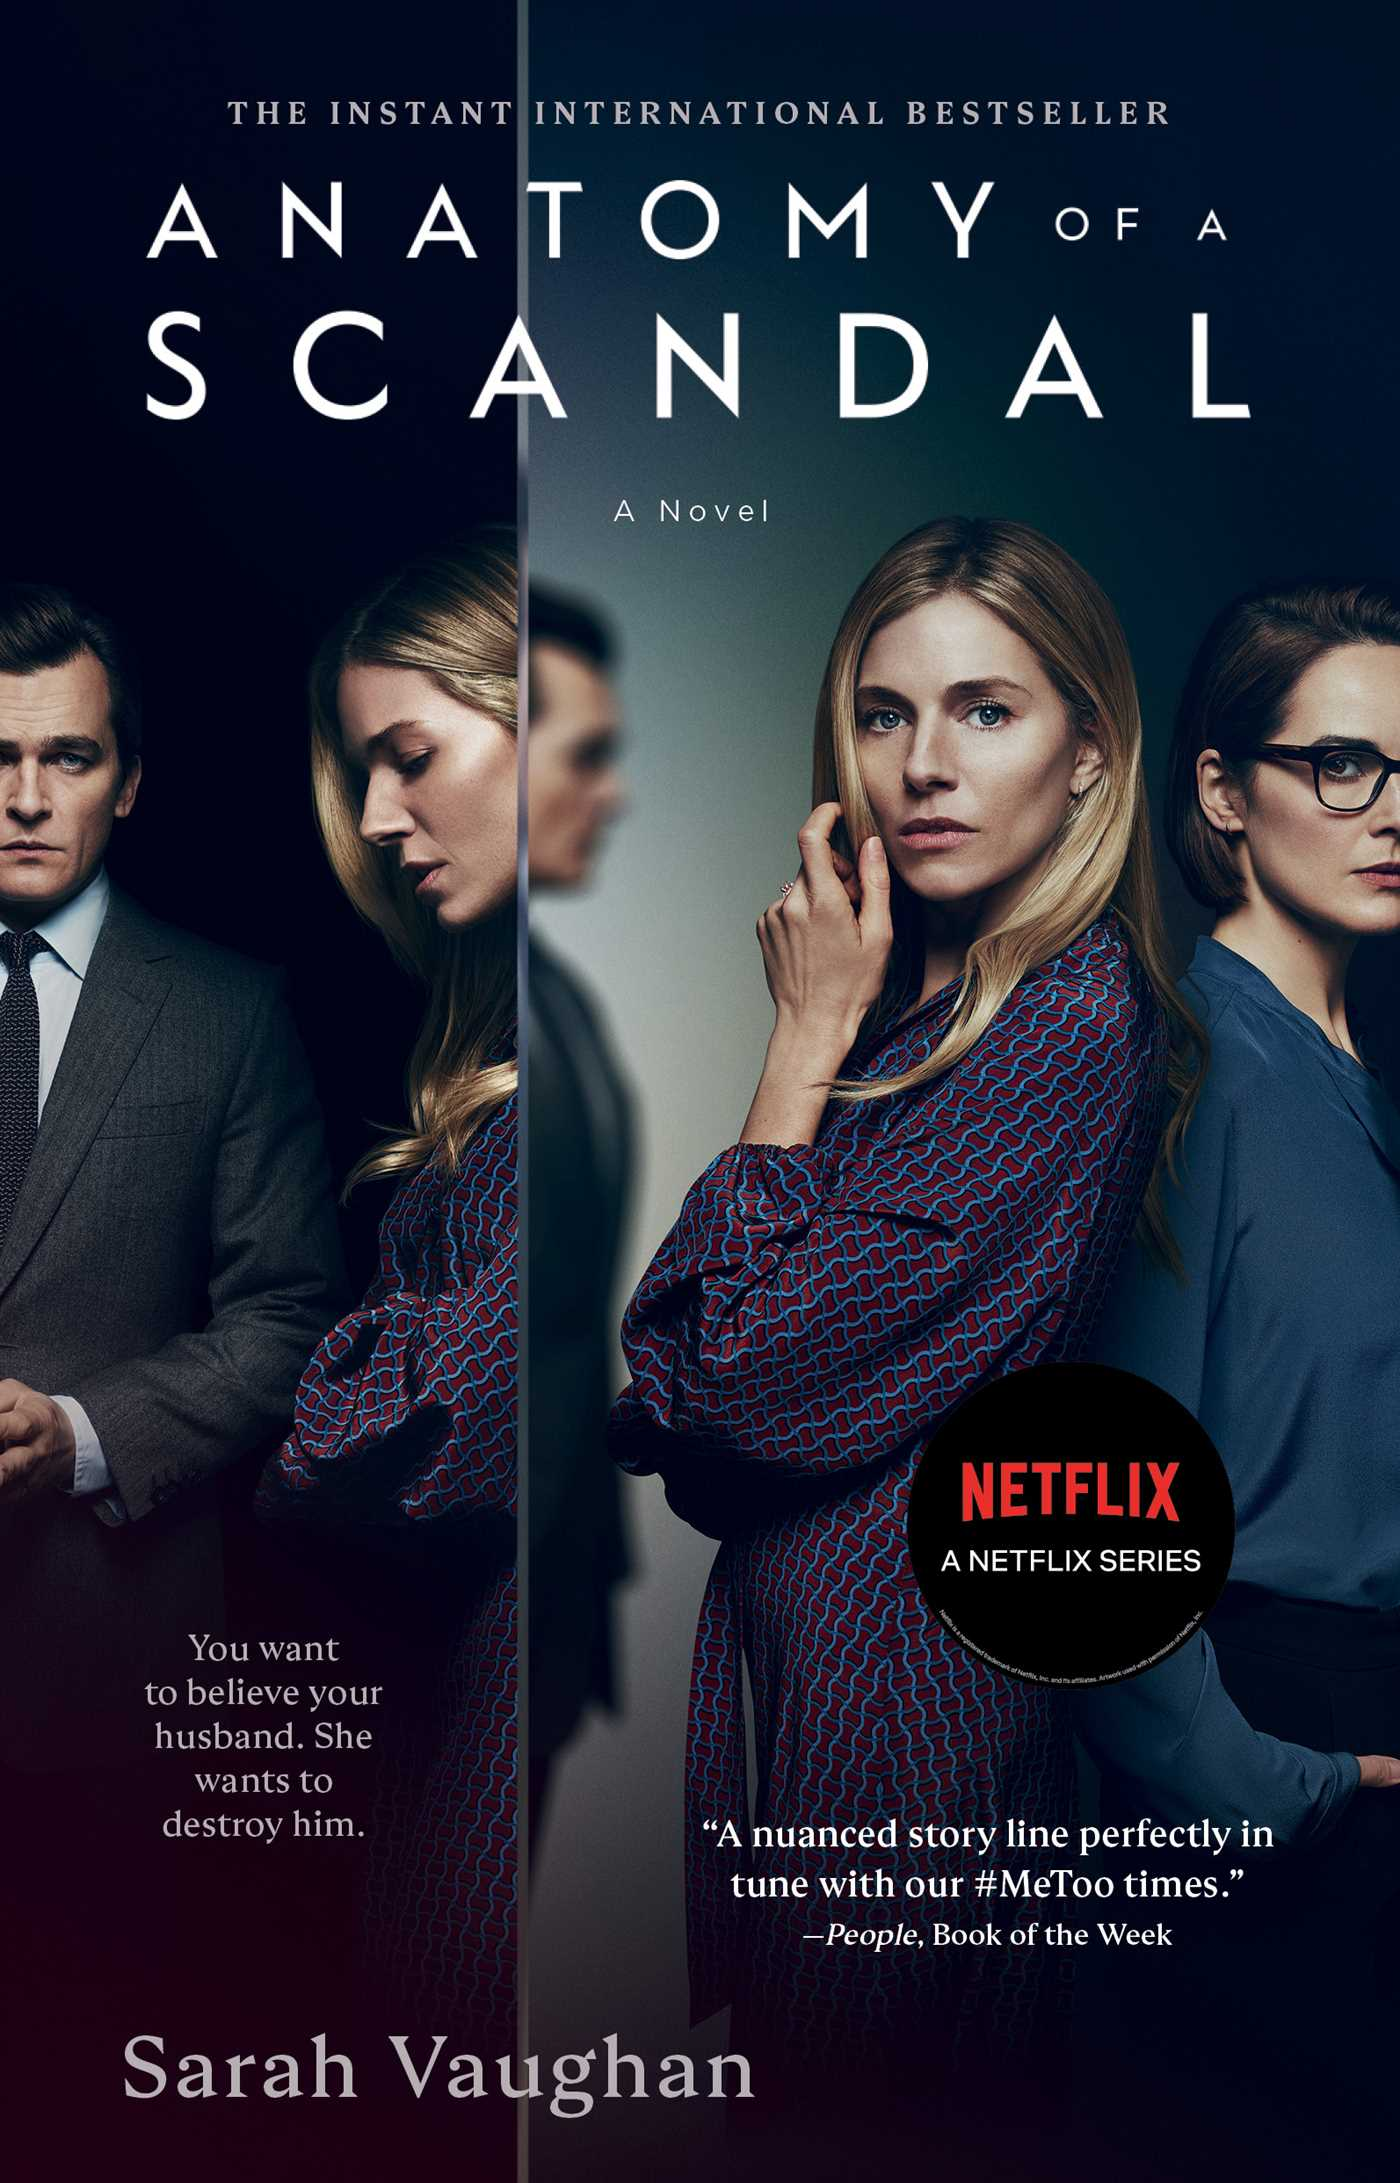 Anatomy of a Scandal A Novel